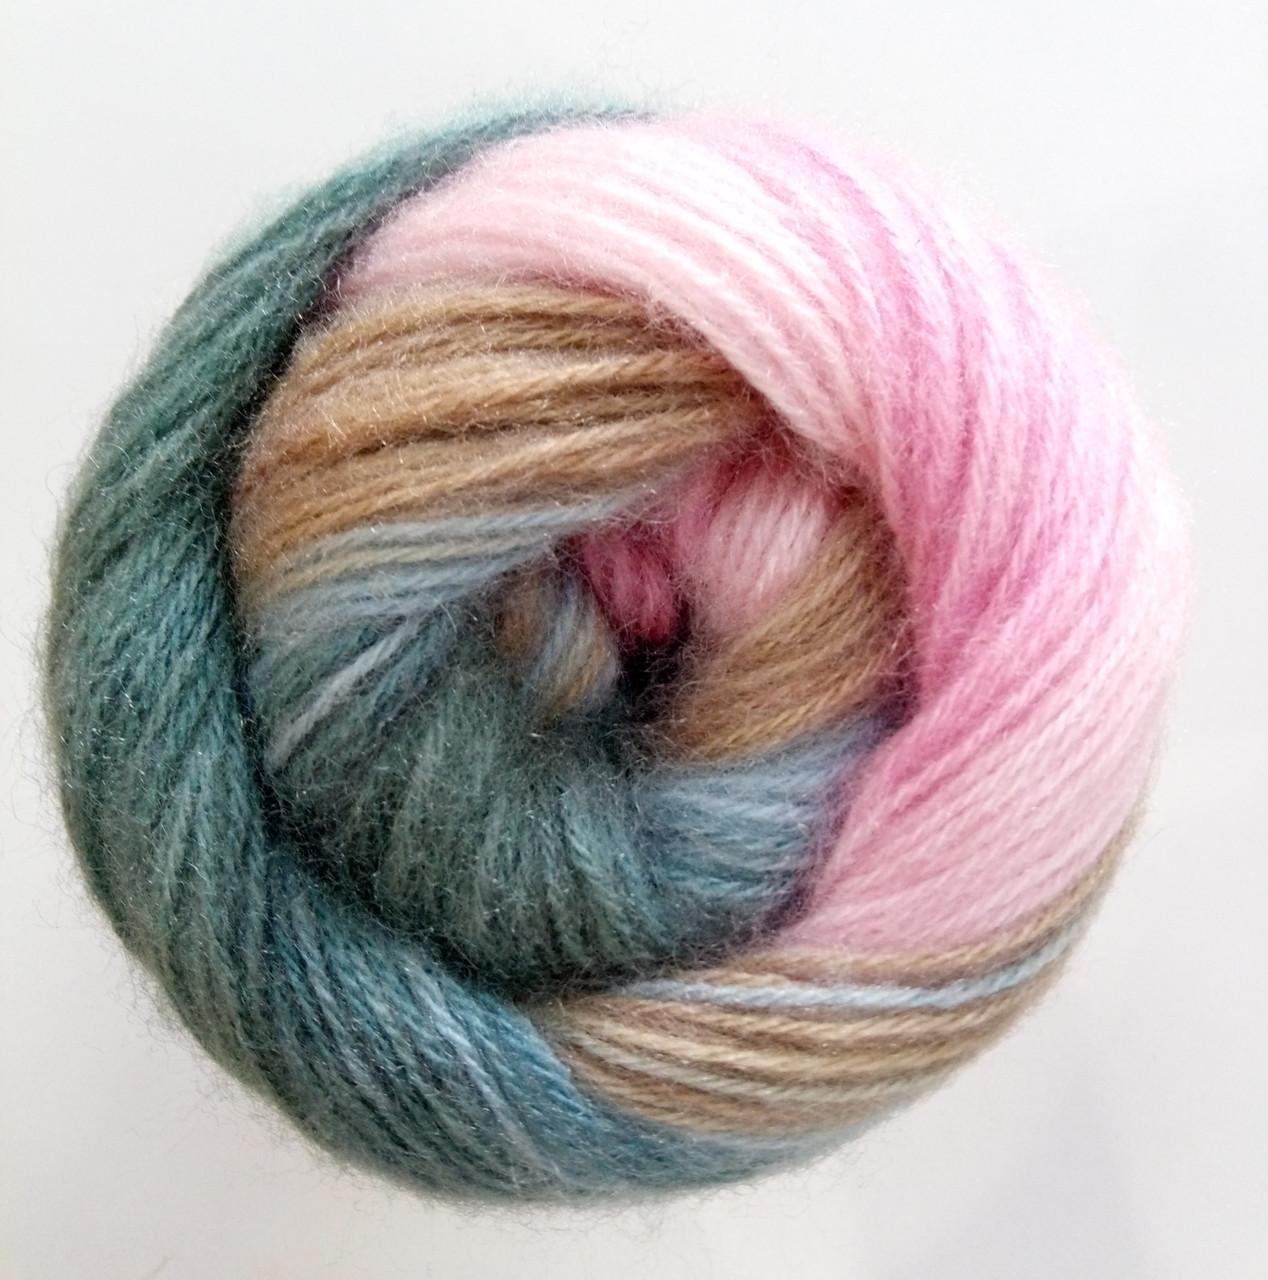 купить пряжа для вязания ангора голд батик Alize код 2970 доставка